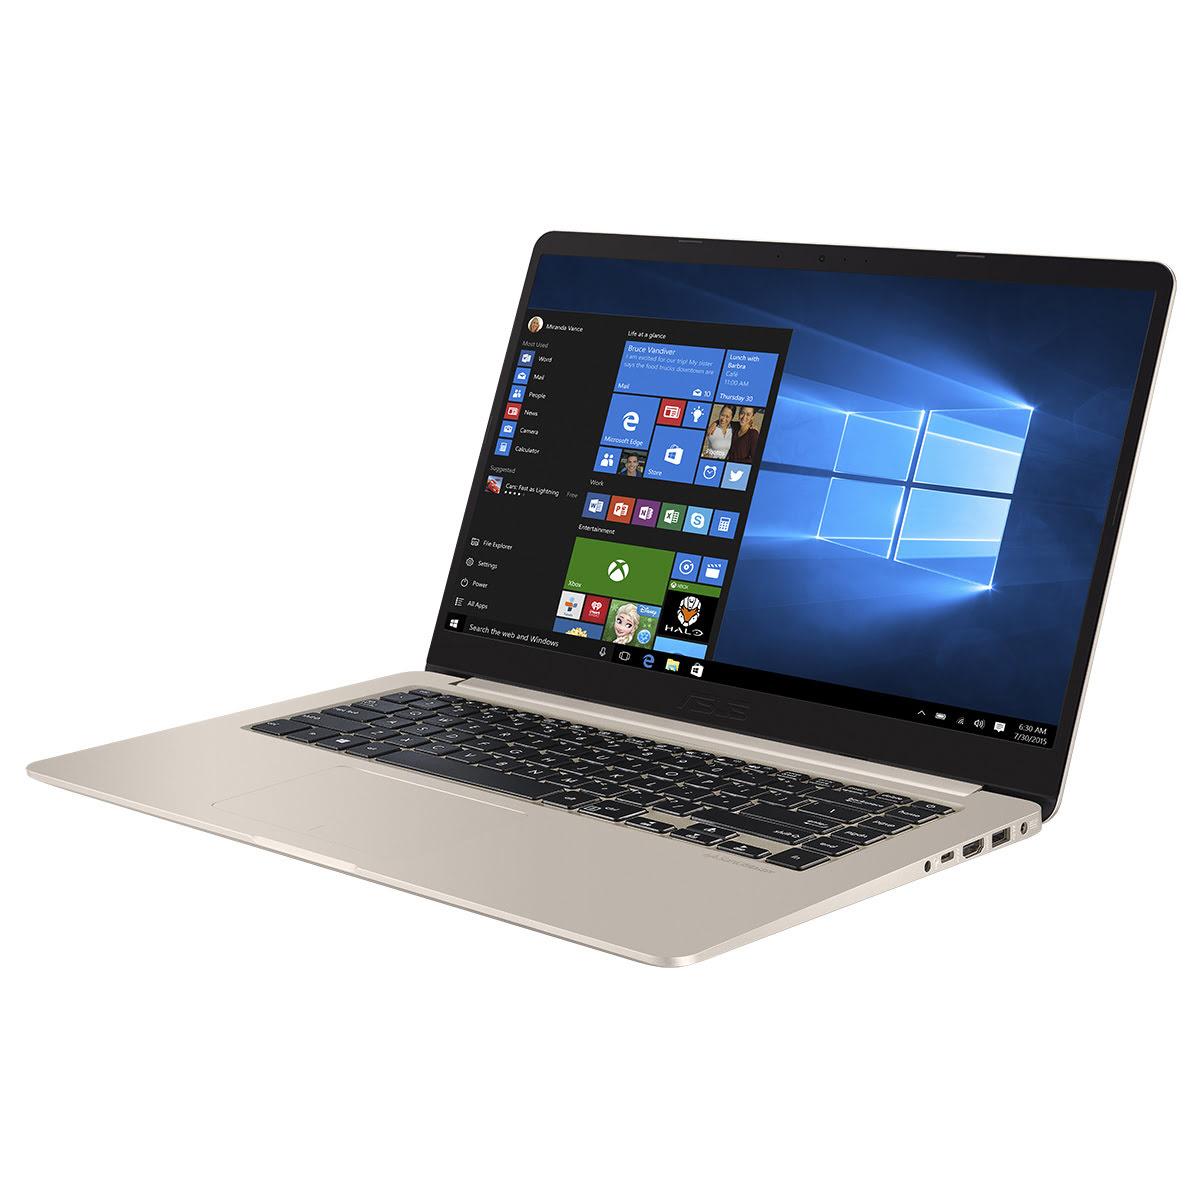 Asus 90NB0FQ5-M07070 - PC portable Asus - Cybertek.fr - 6